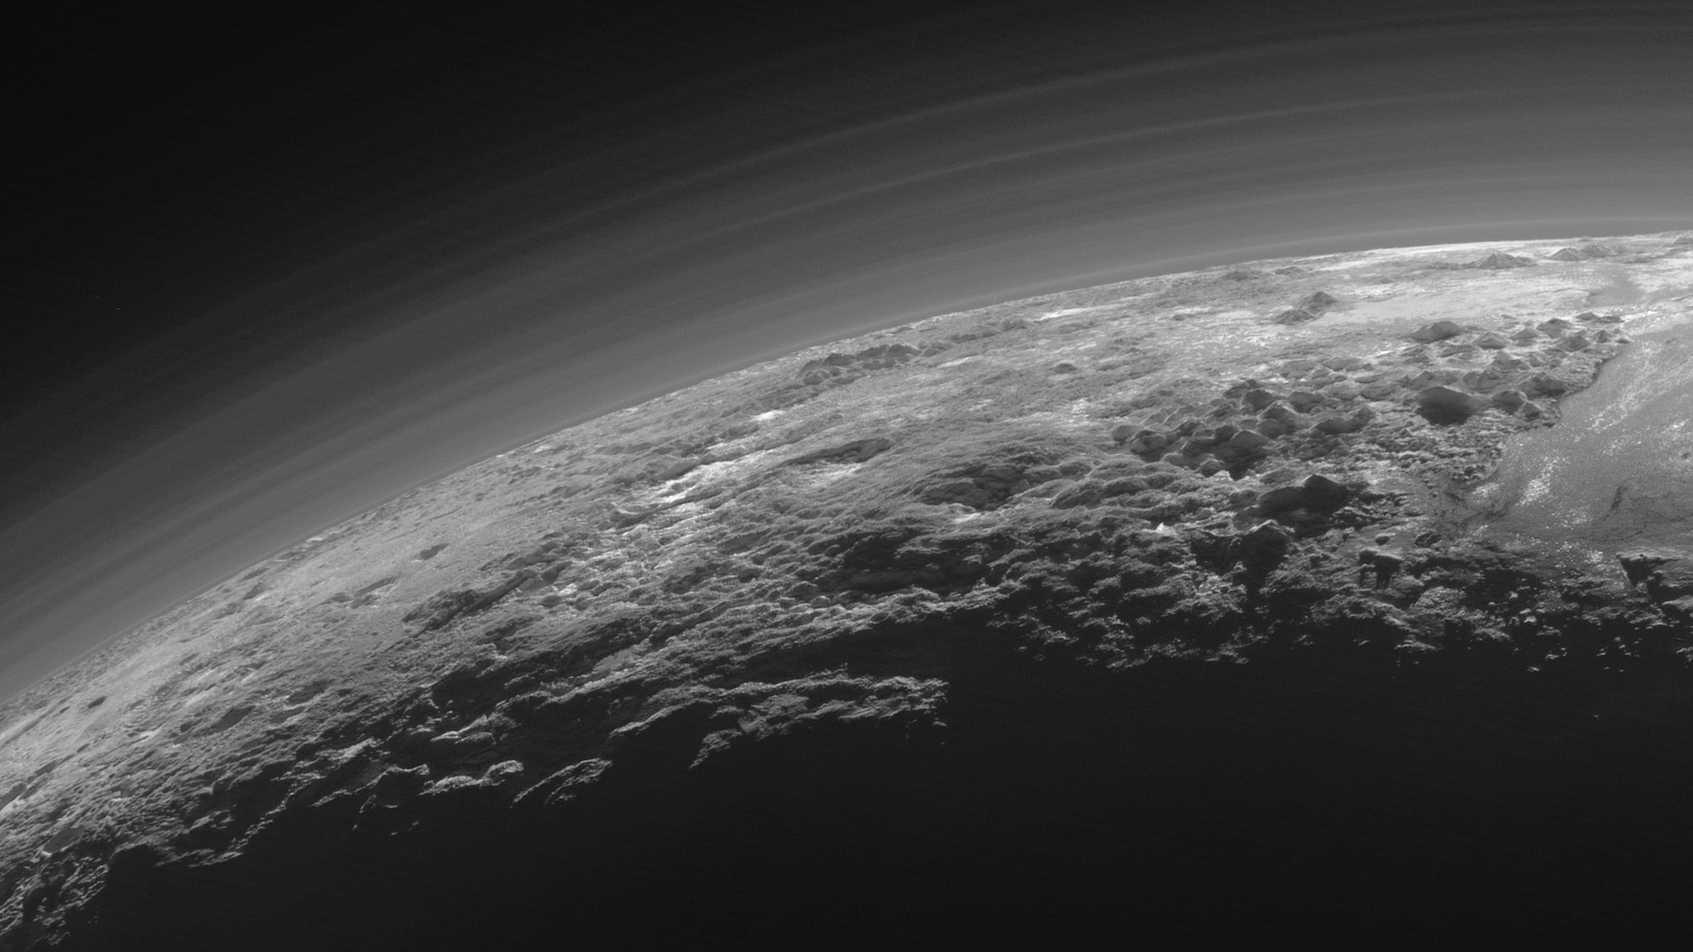 Pluto-Oberfläche